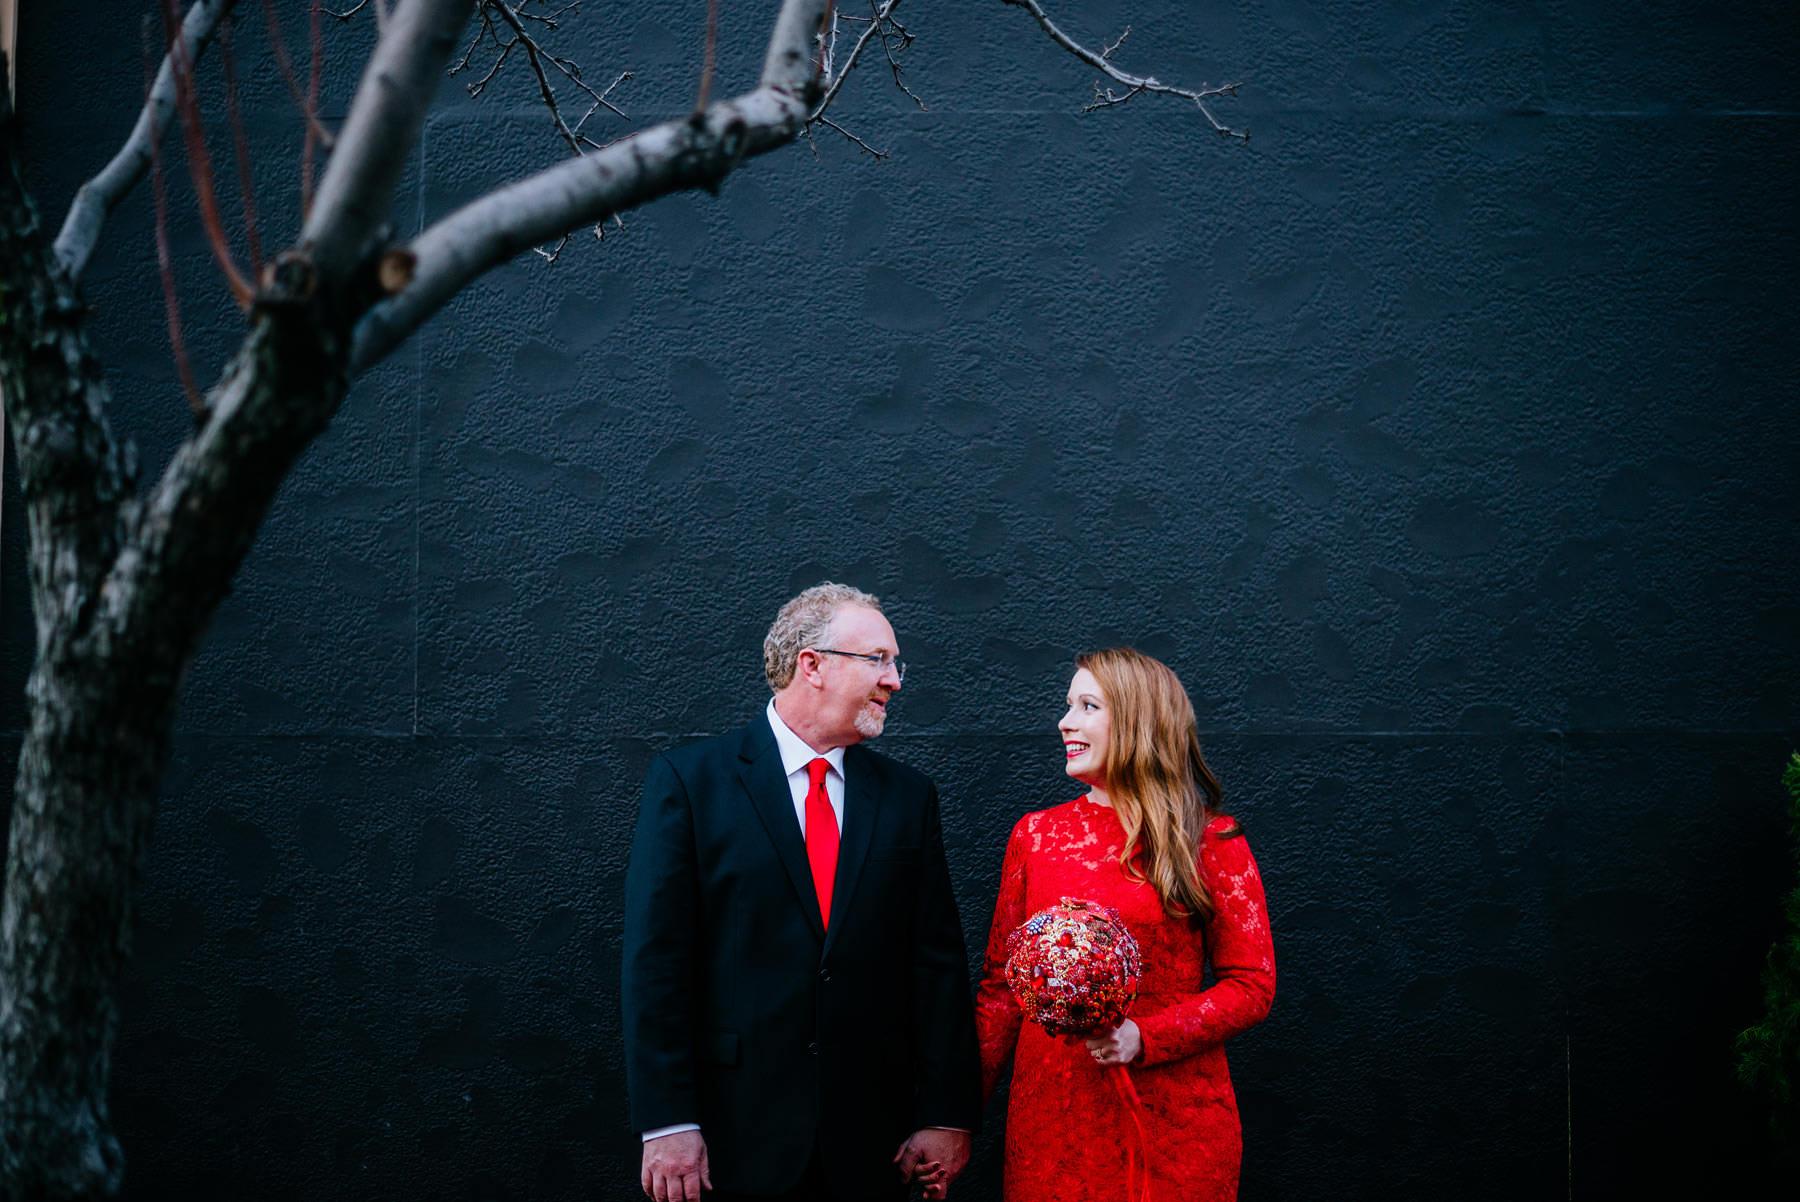 downtown charleston wv wedding portraits